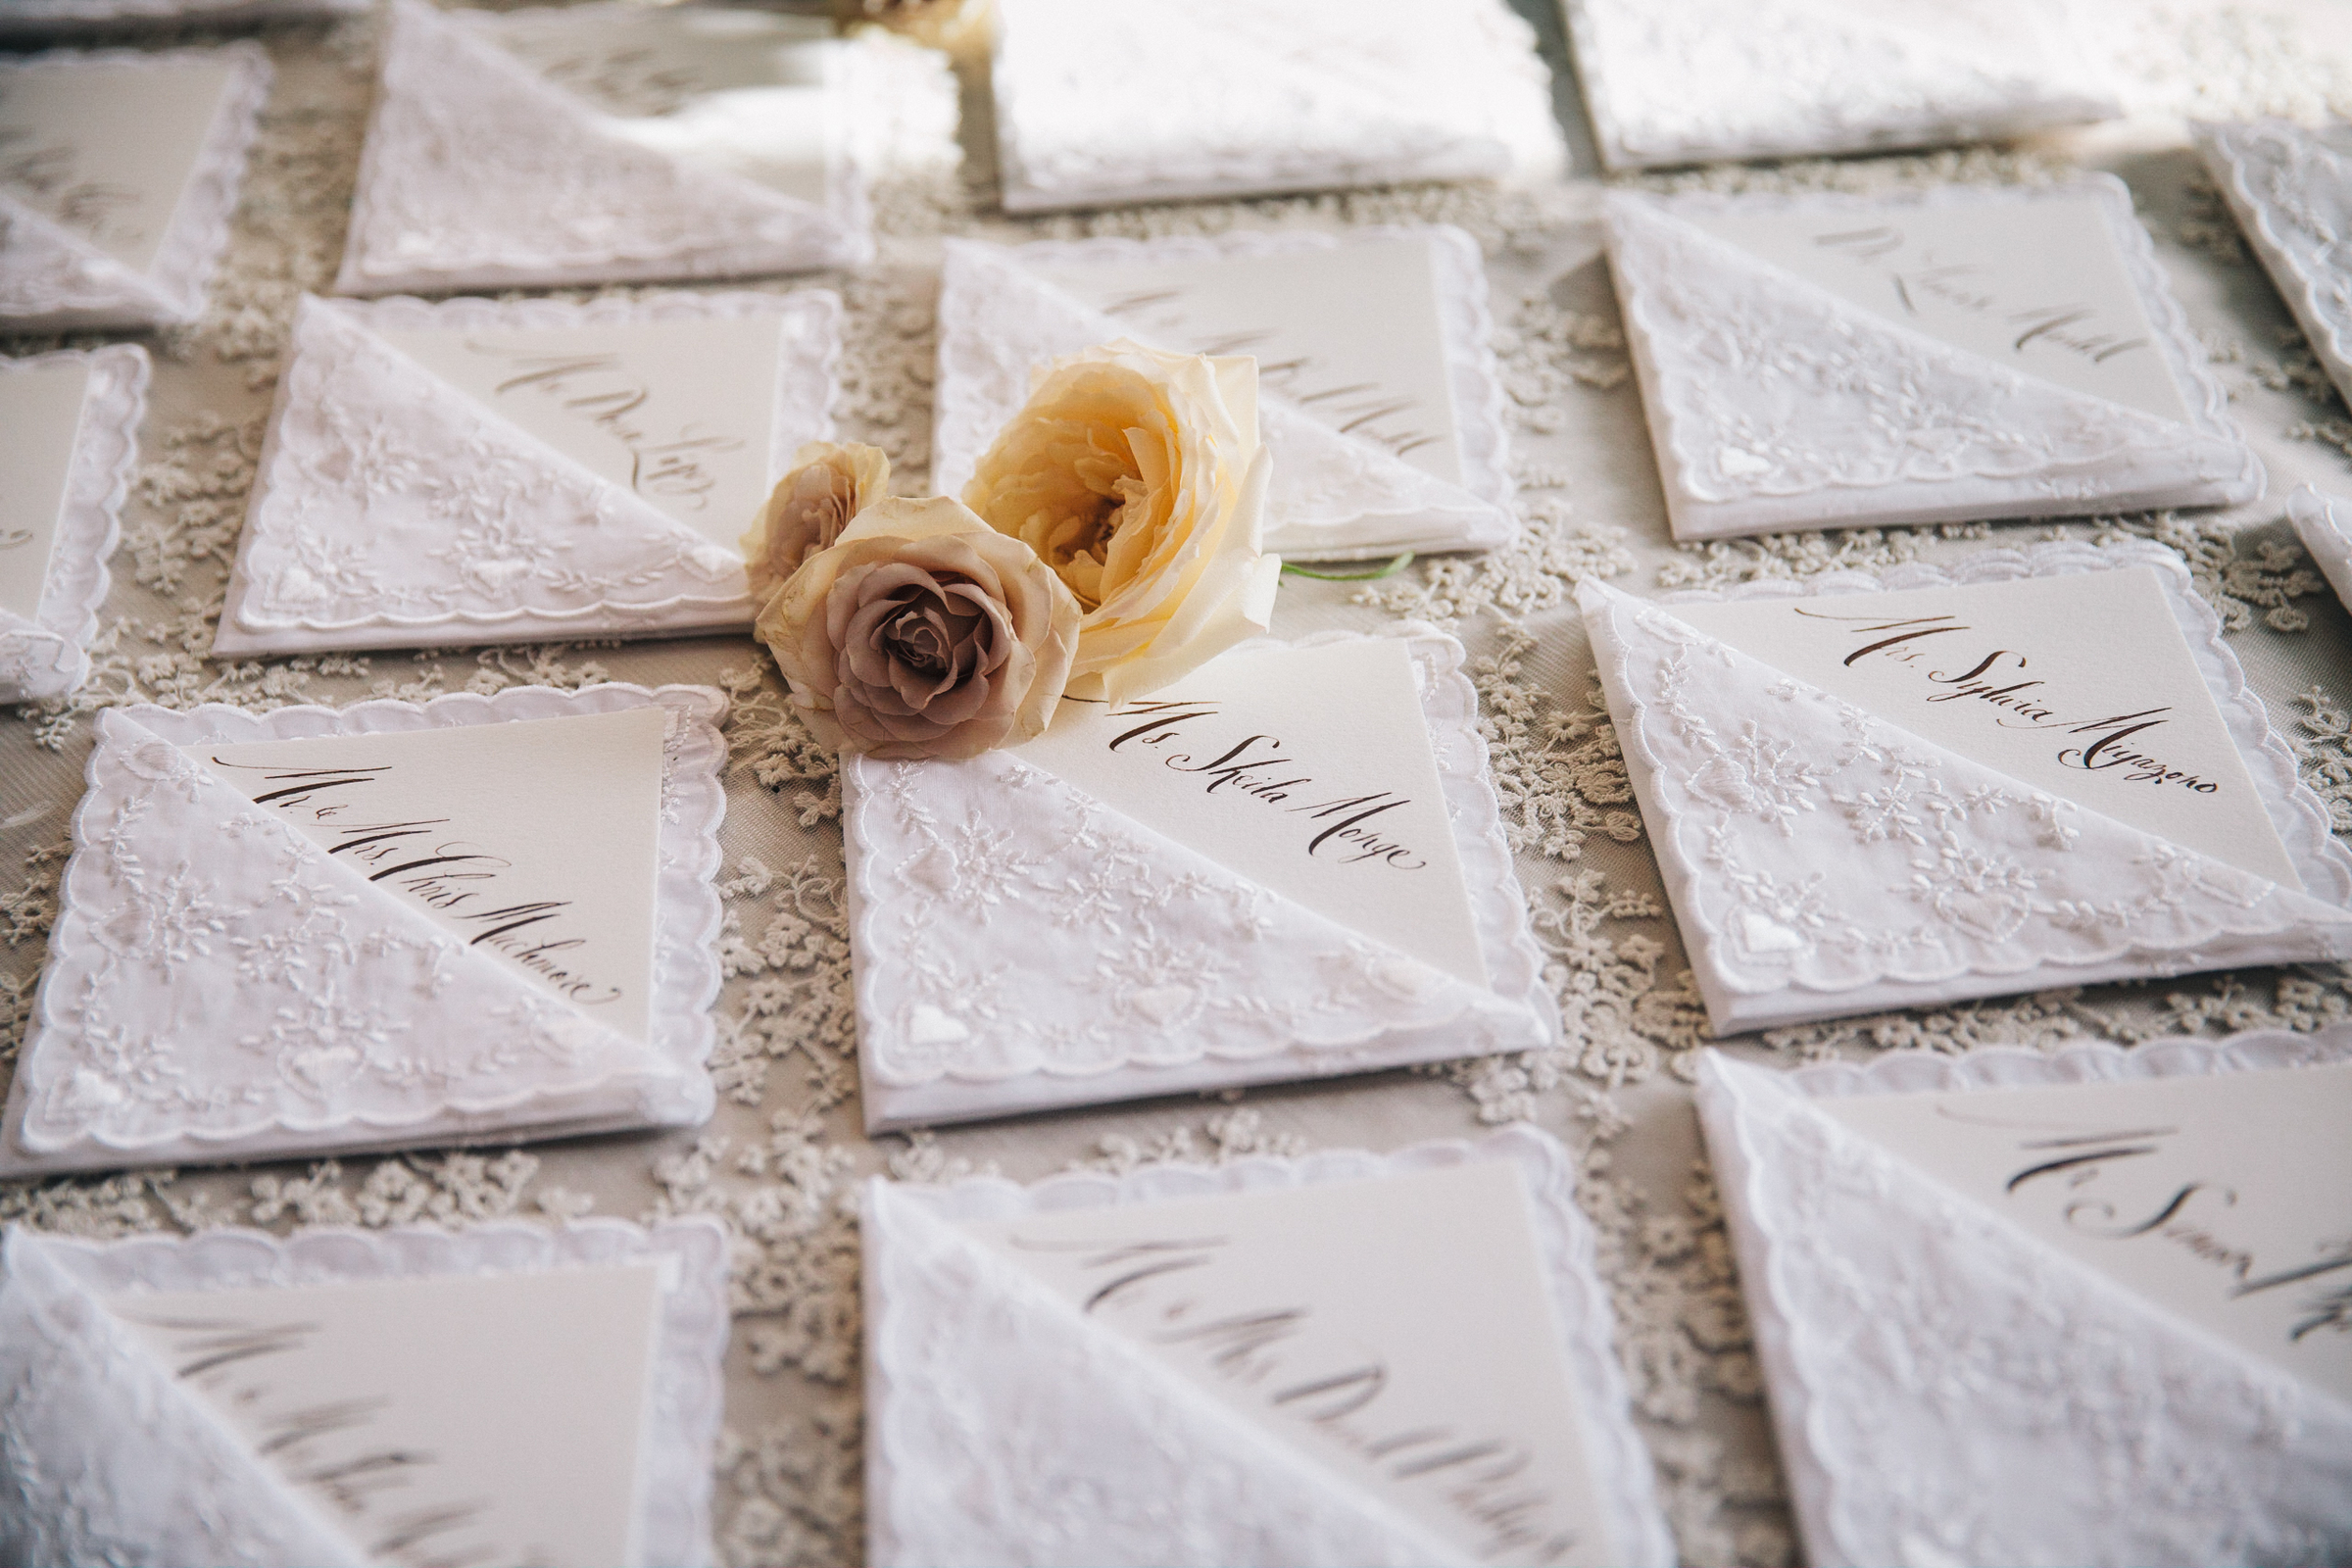 Cec_New_York_Lyndsey_Hamilton_Events_Wyoming_Amangani_Gold_Custom_Luxury_Wedding_Invitations_Stationery_Lifestlye_Inspiration_Personalized_Gold_Foil_Ivory_Jackson_Hole_Destination_Couture62.jpg